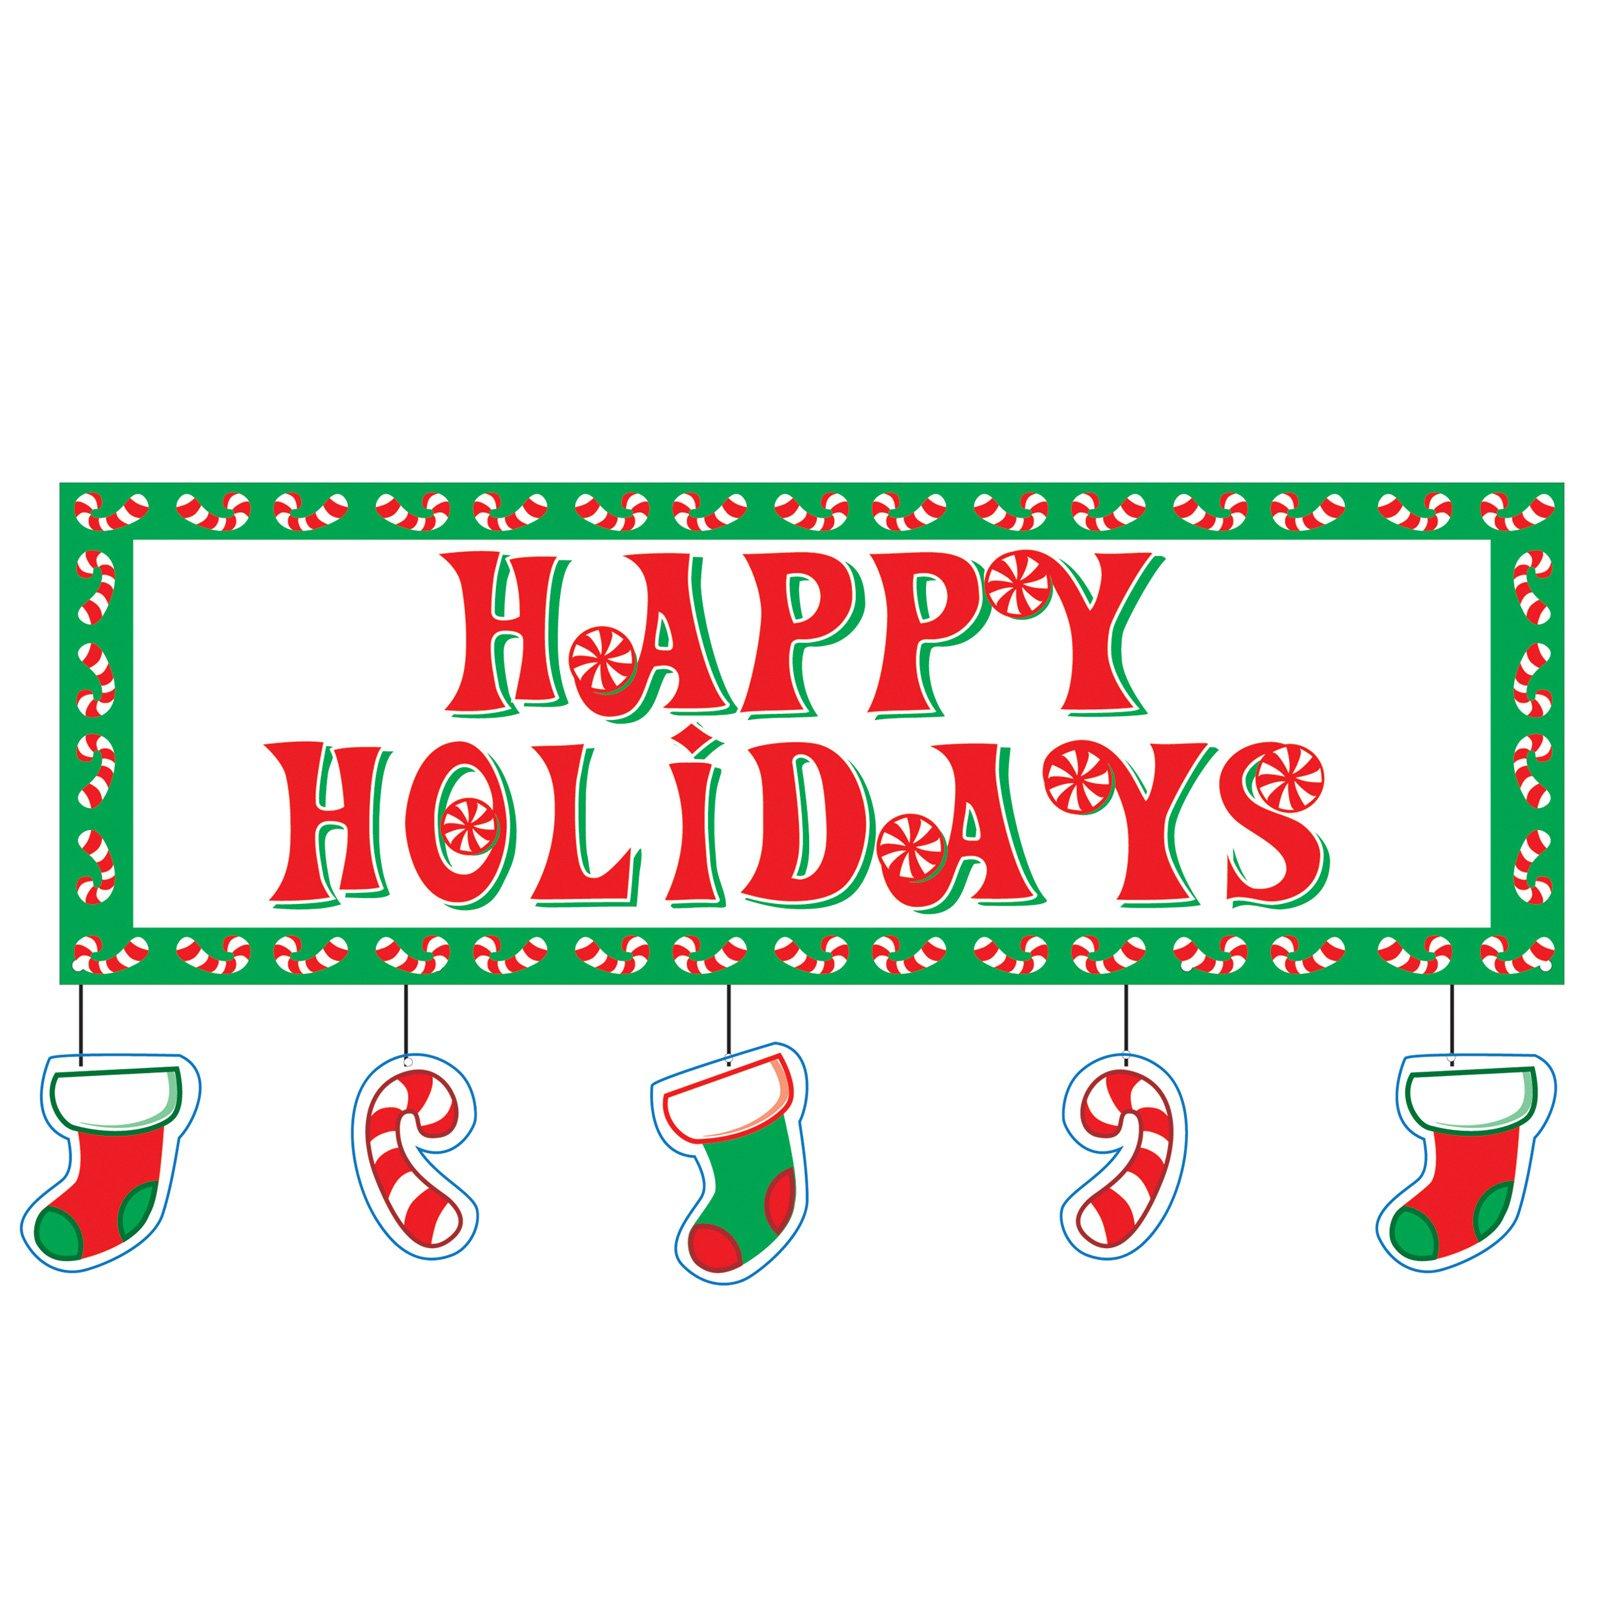 Happy Holidays Http Www Imgion Com Image-Happy Holidays Http Www Imgion Com Images 01 Winter Happy-17